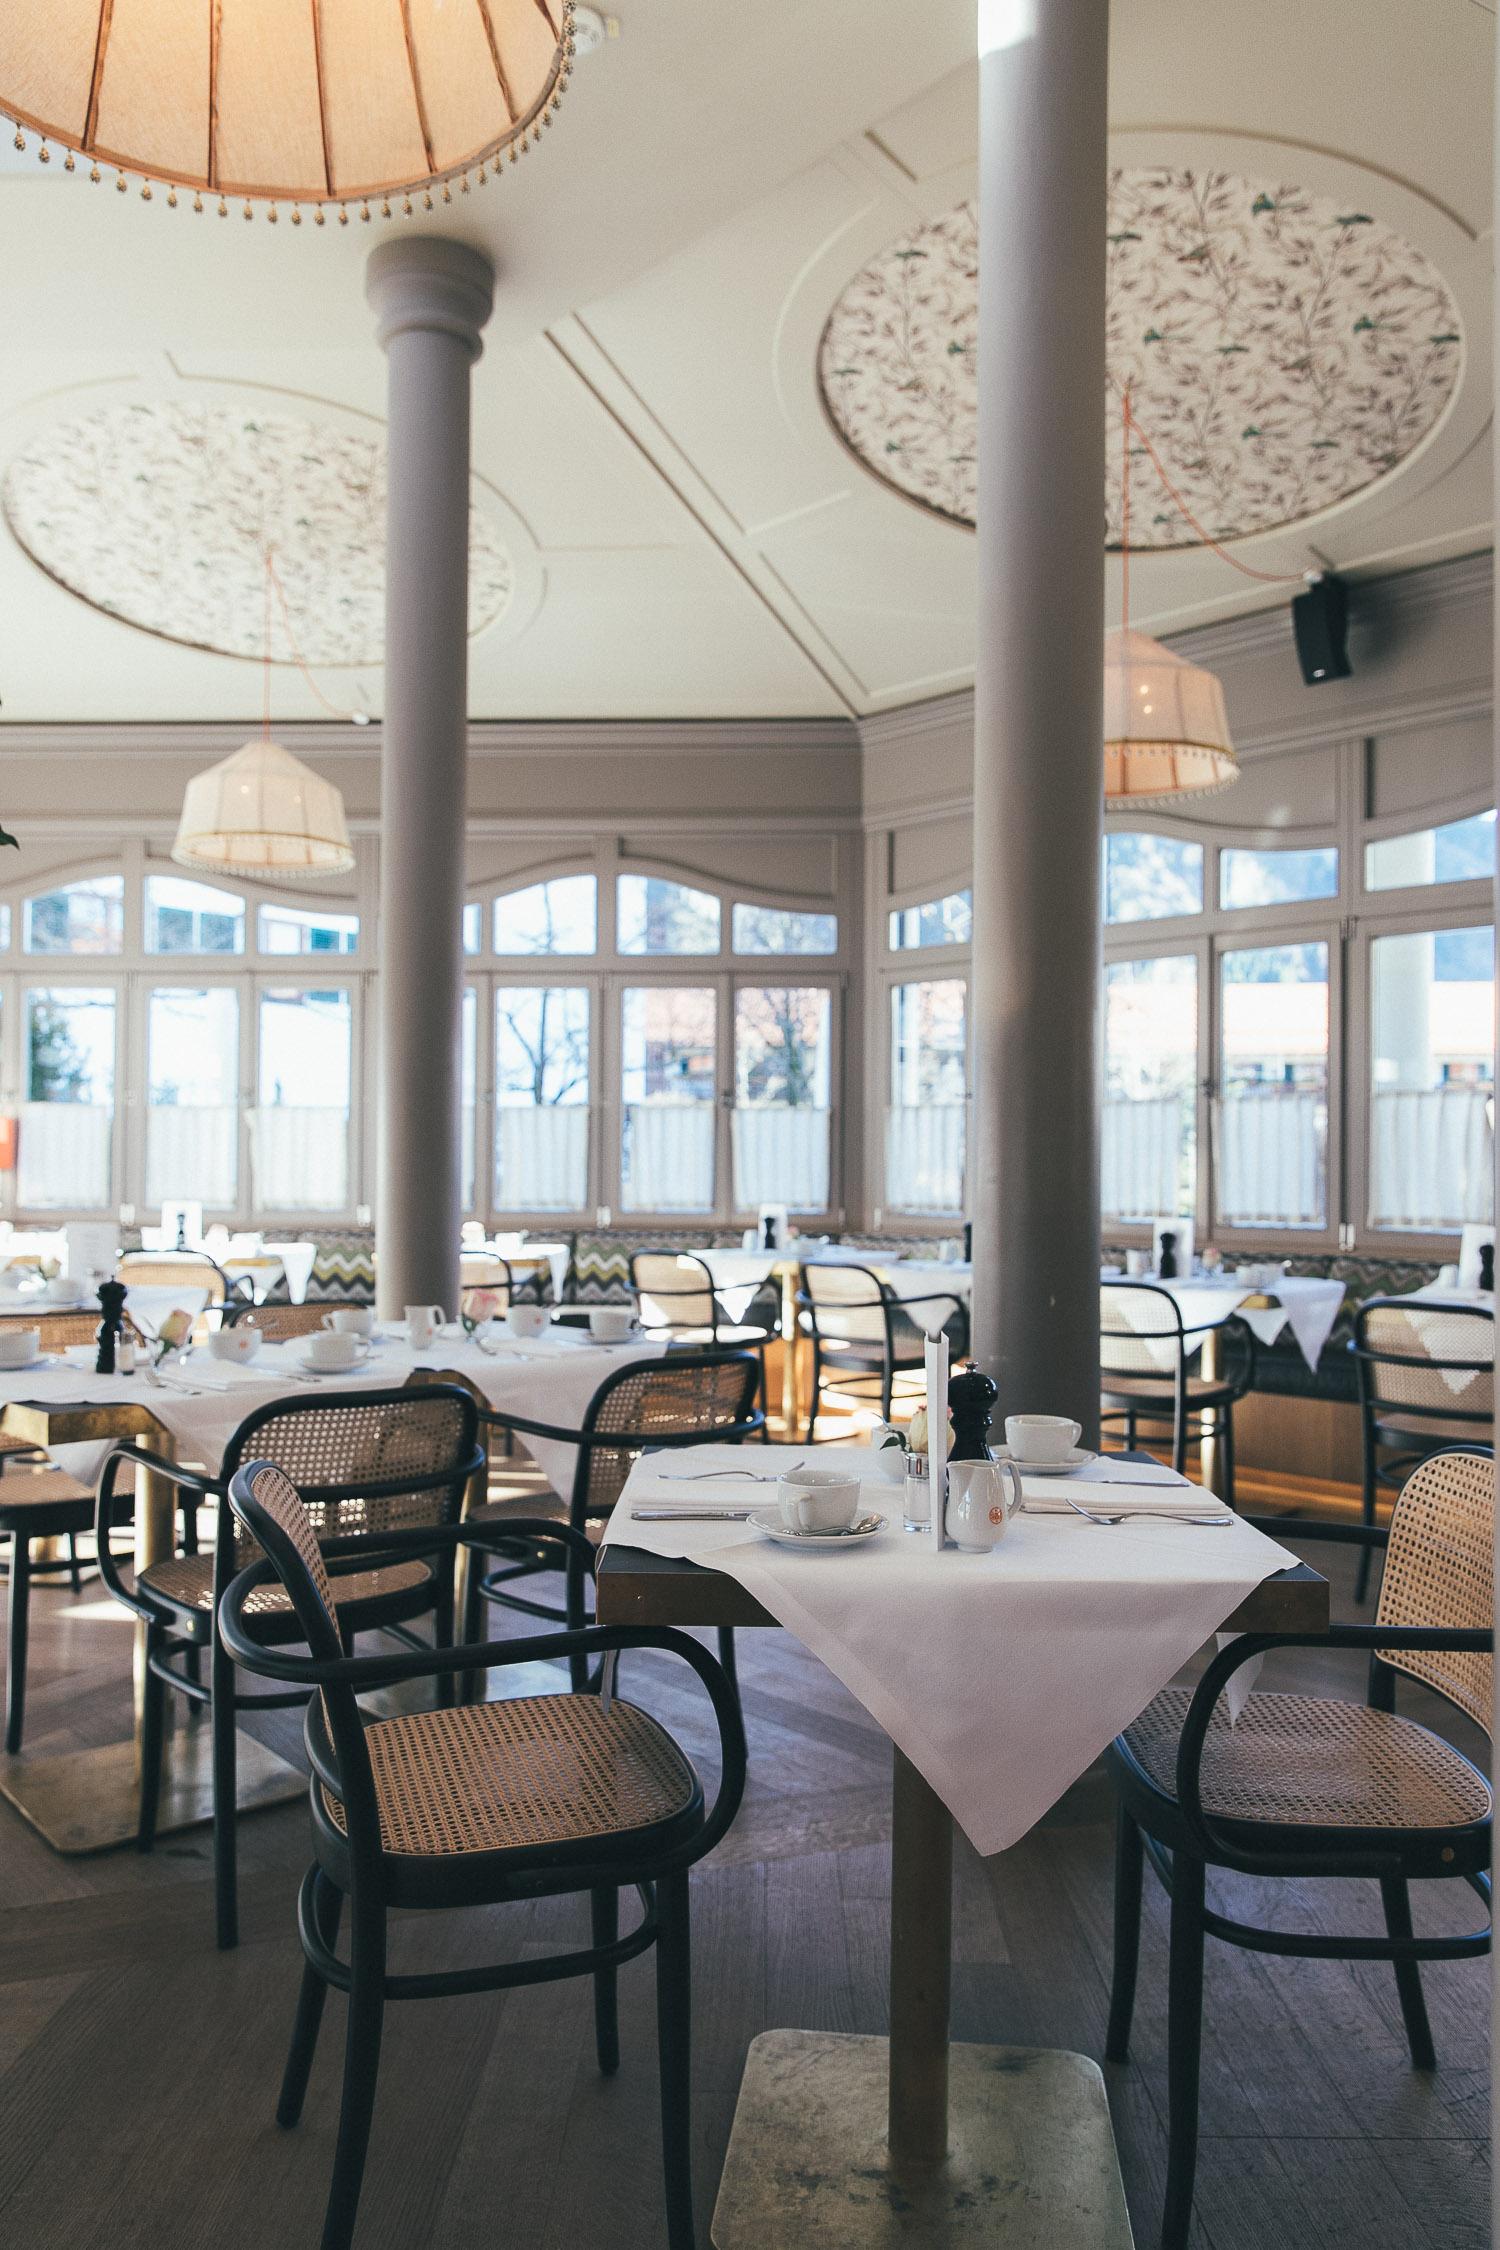 Frühstück im Hotel Bachmair Weissach am Tegernsee